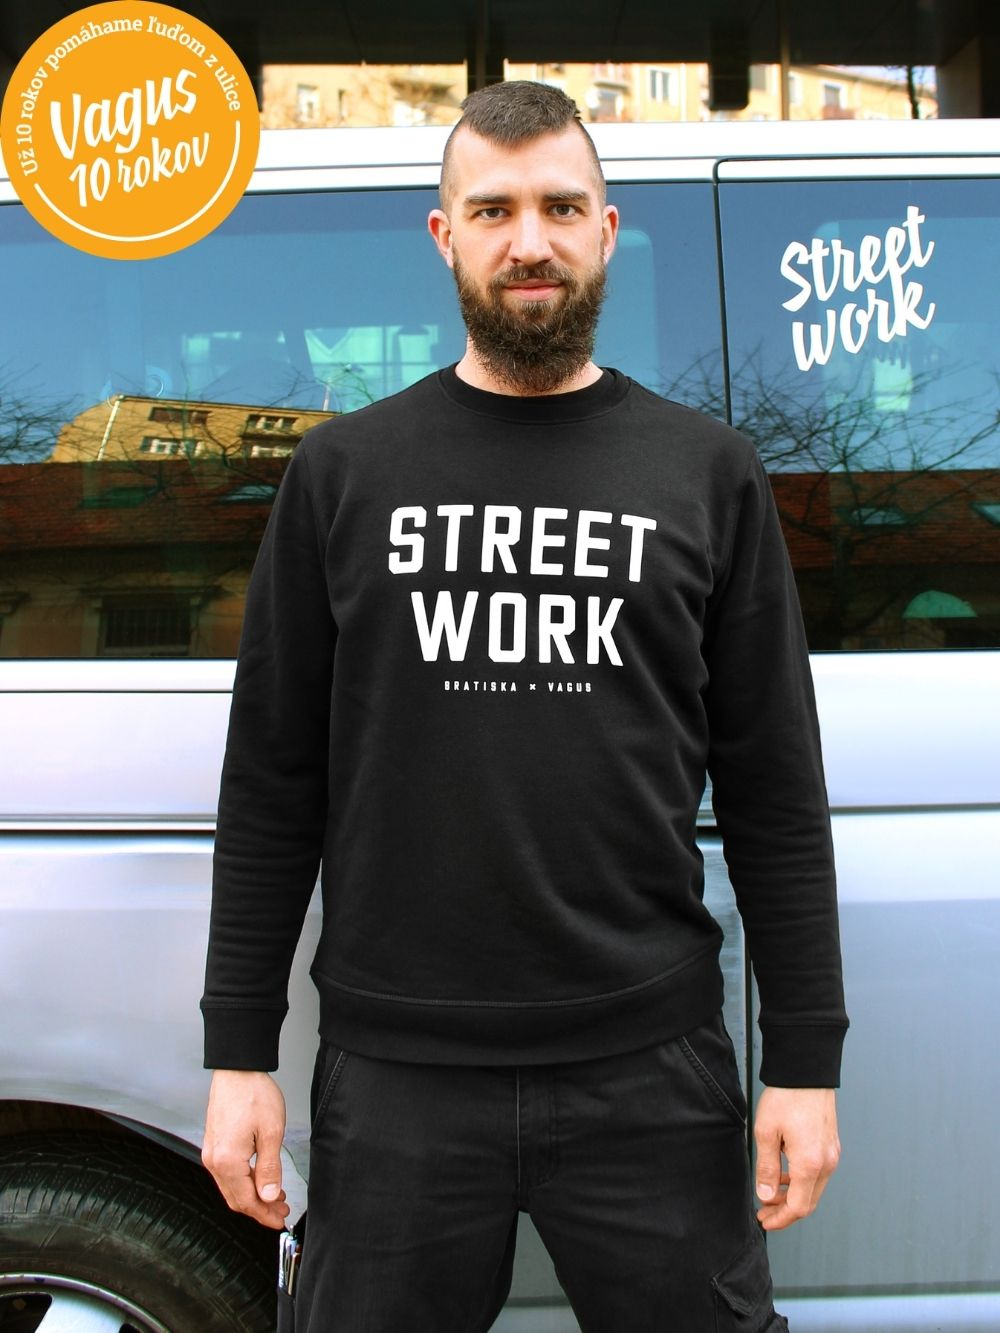 Streetwork x Vagus